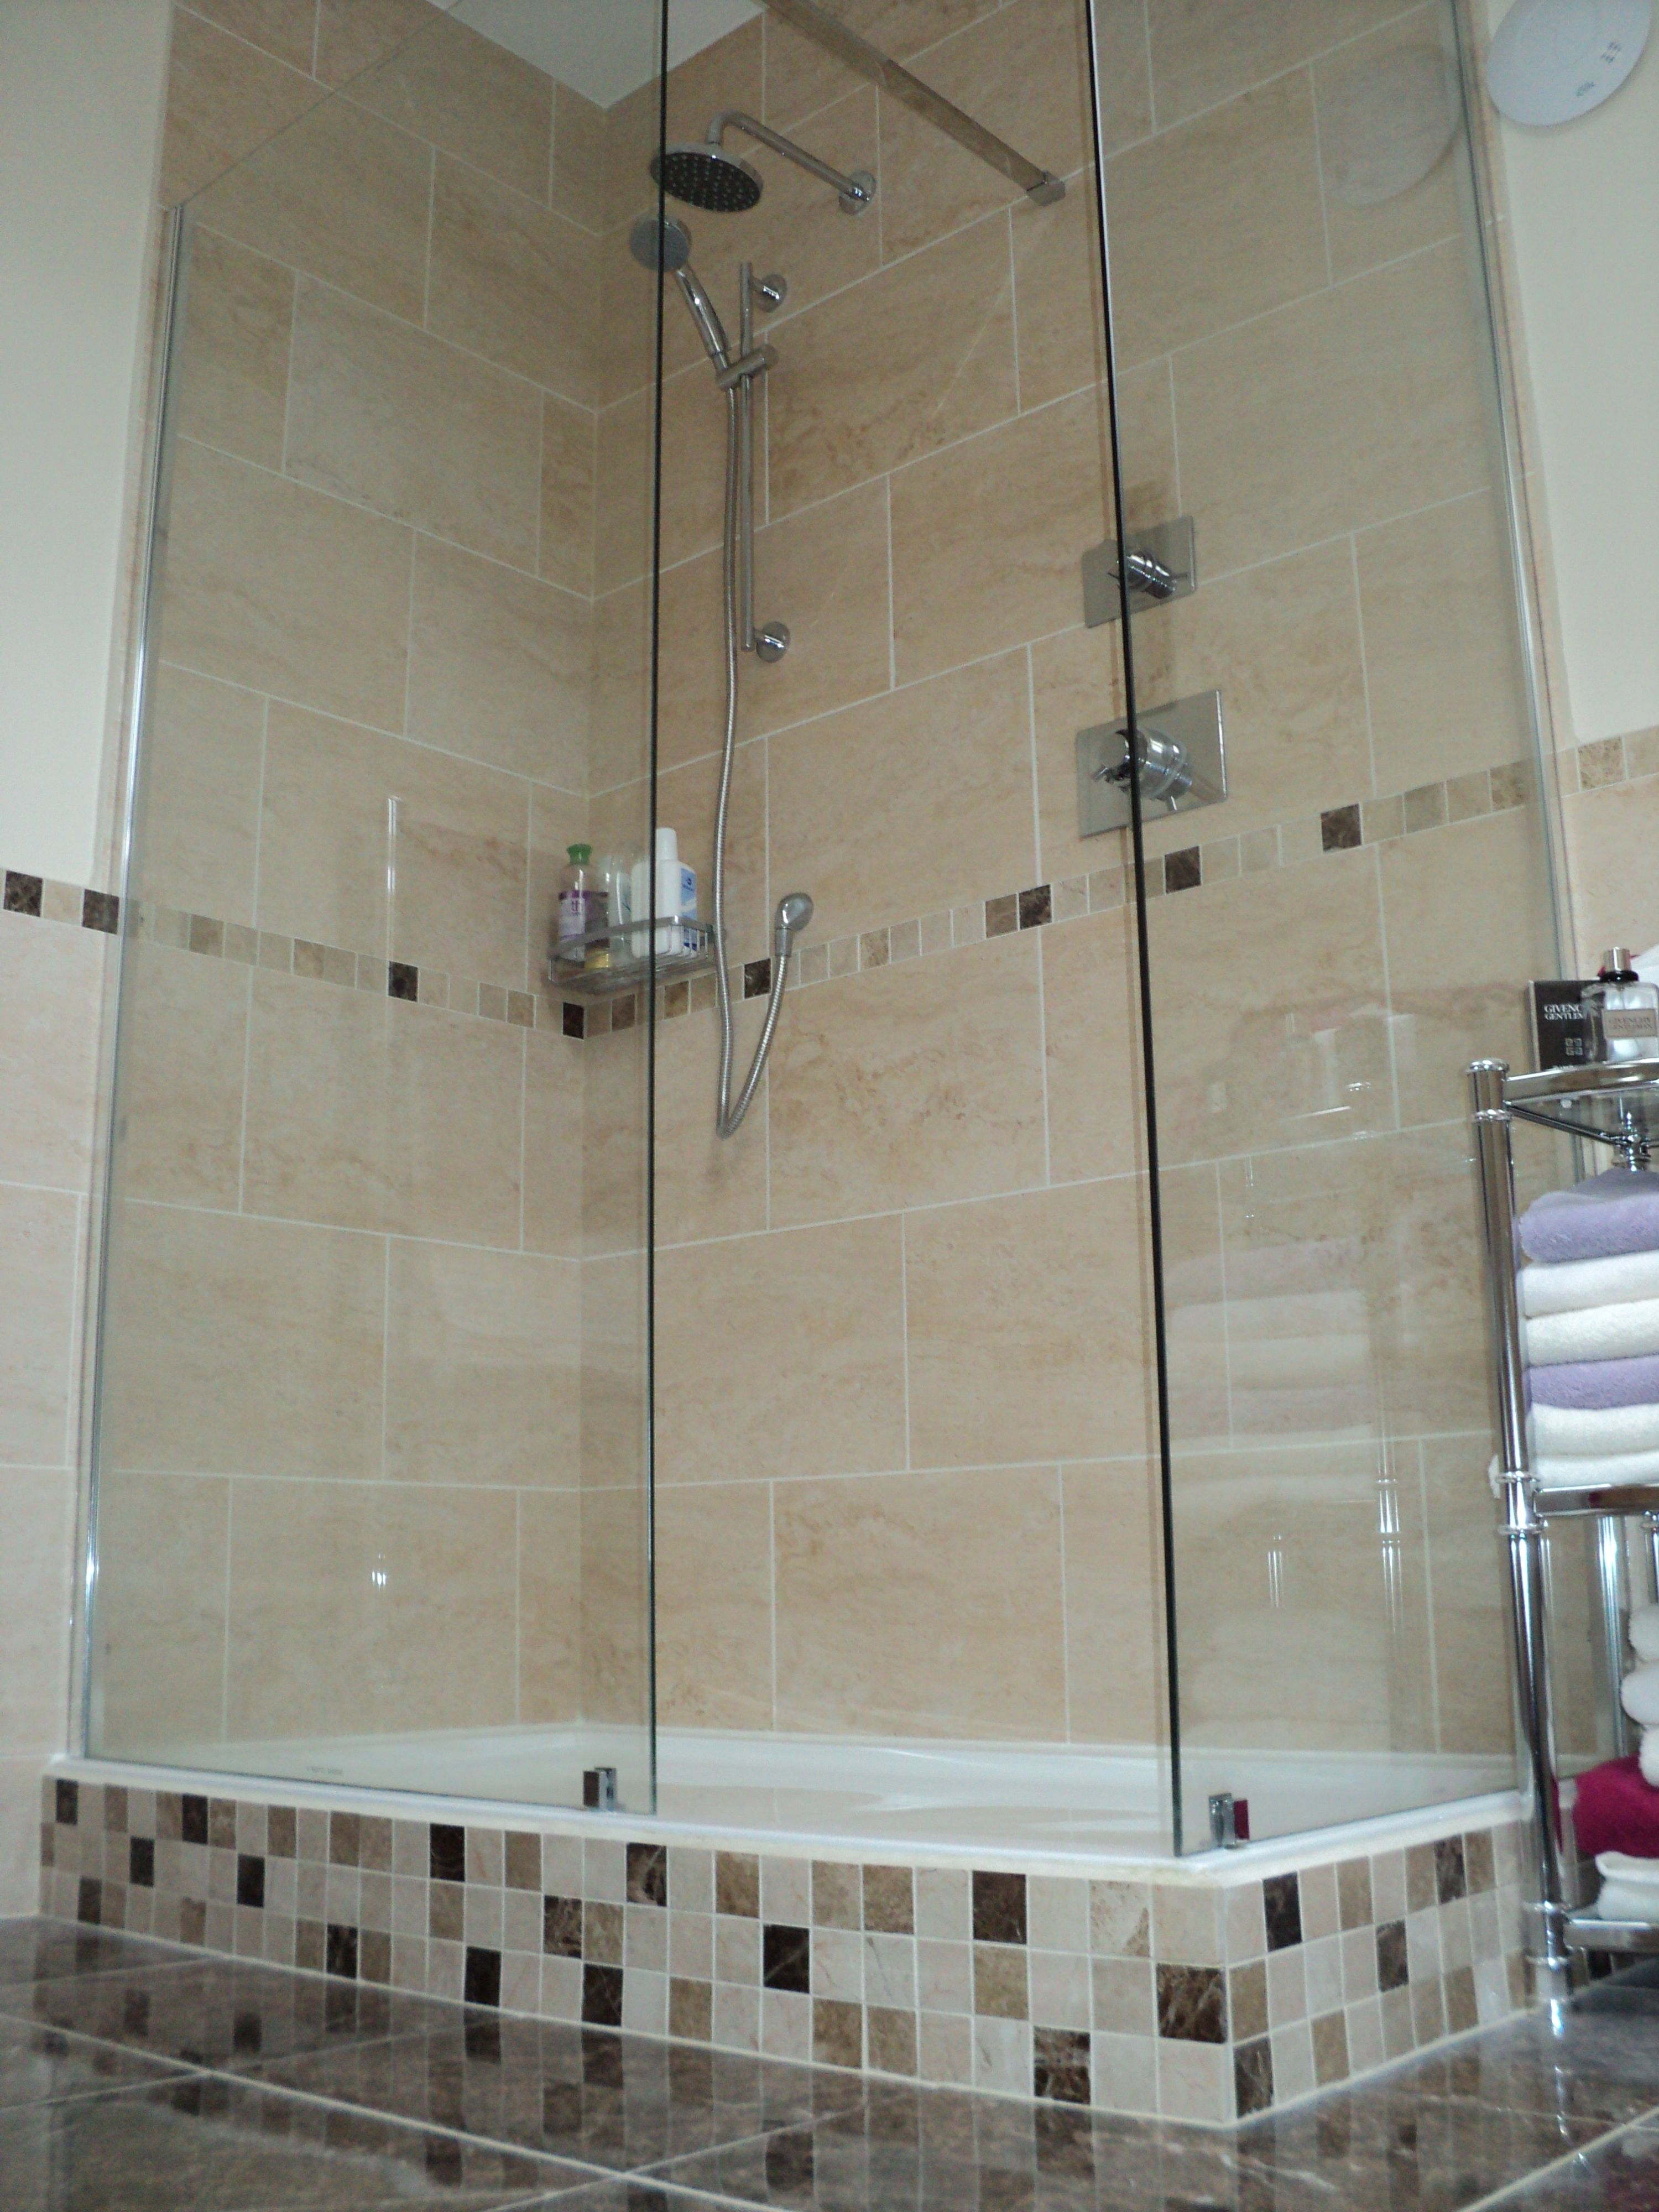 Strip Existing En Suite Fit New Bathroom Suite Tile Walls And Floors Bathroom Kitchen Tiling Shower Experienced Fi Bathroom Suite Ensuite Bathroom